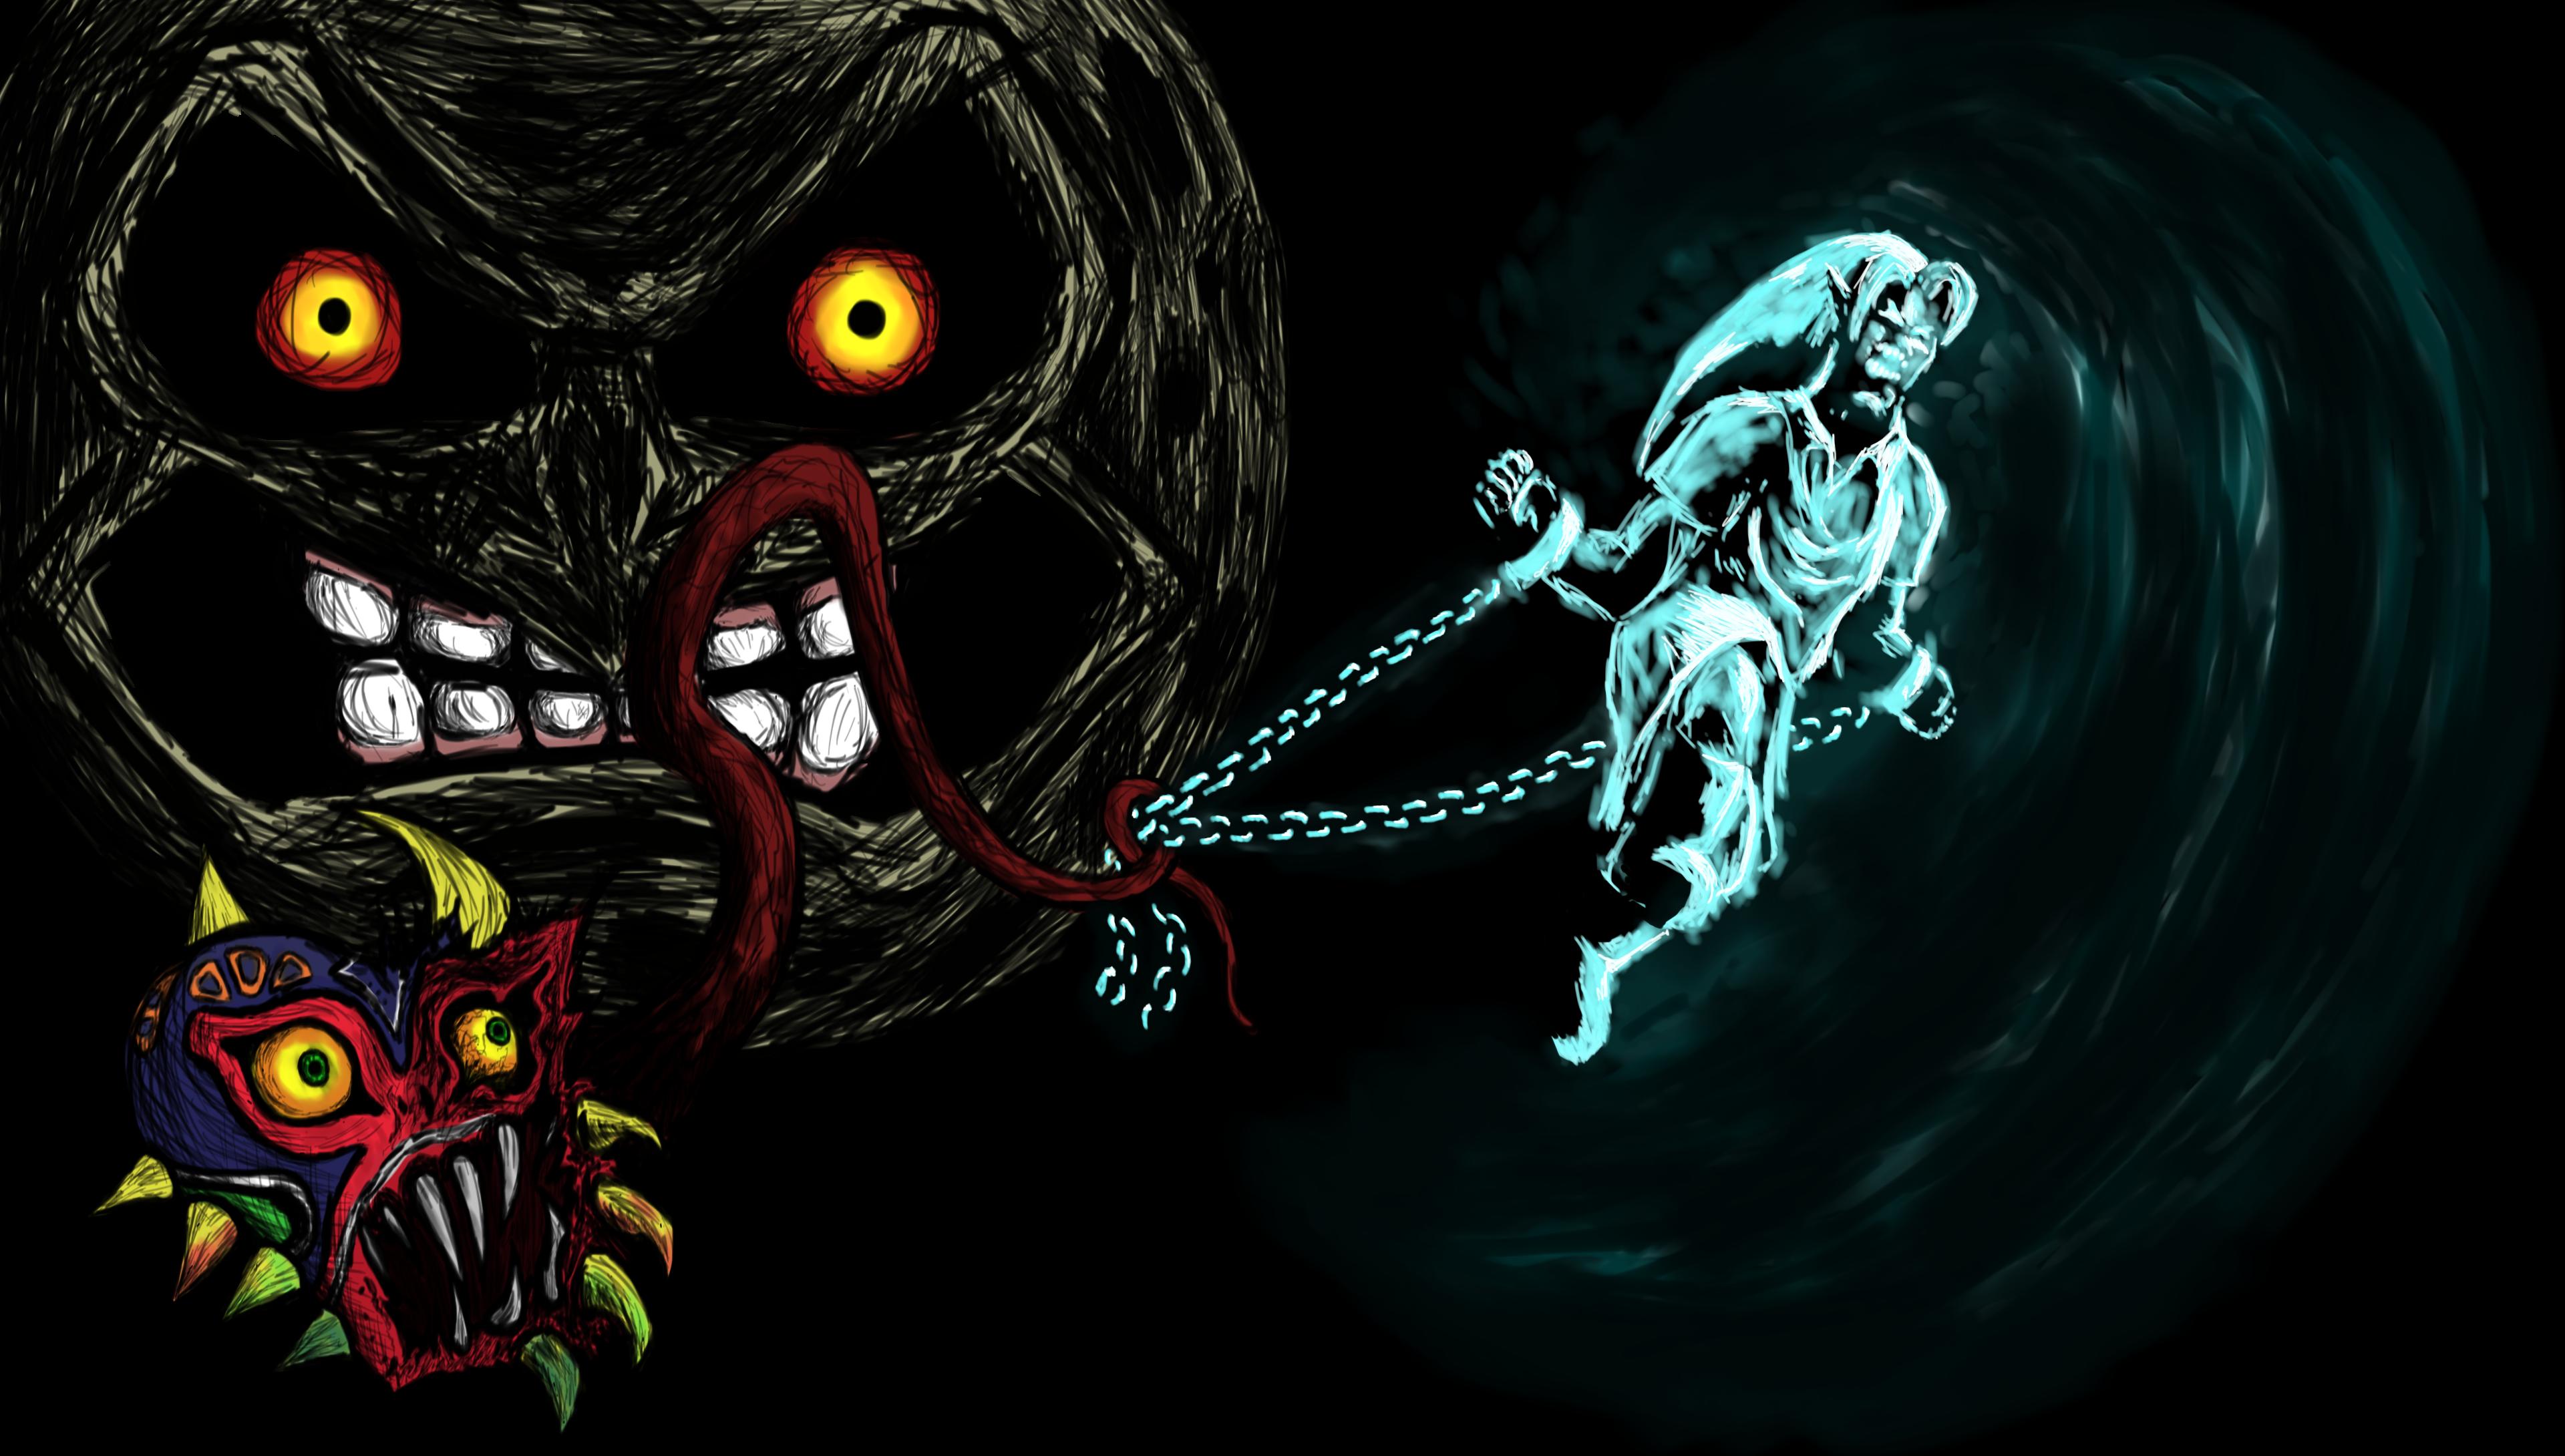 Majora's Mask: The Struggle of Link by CarlosEd on DeviantArt